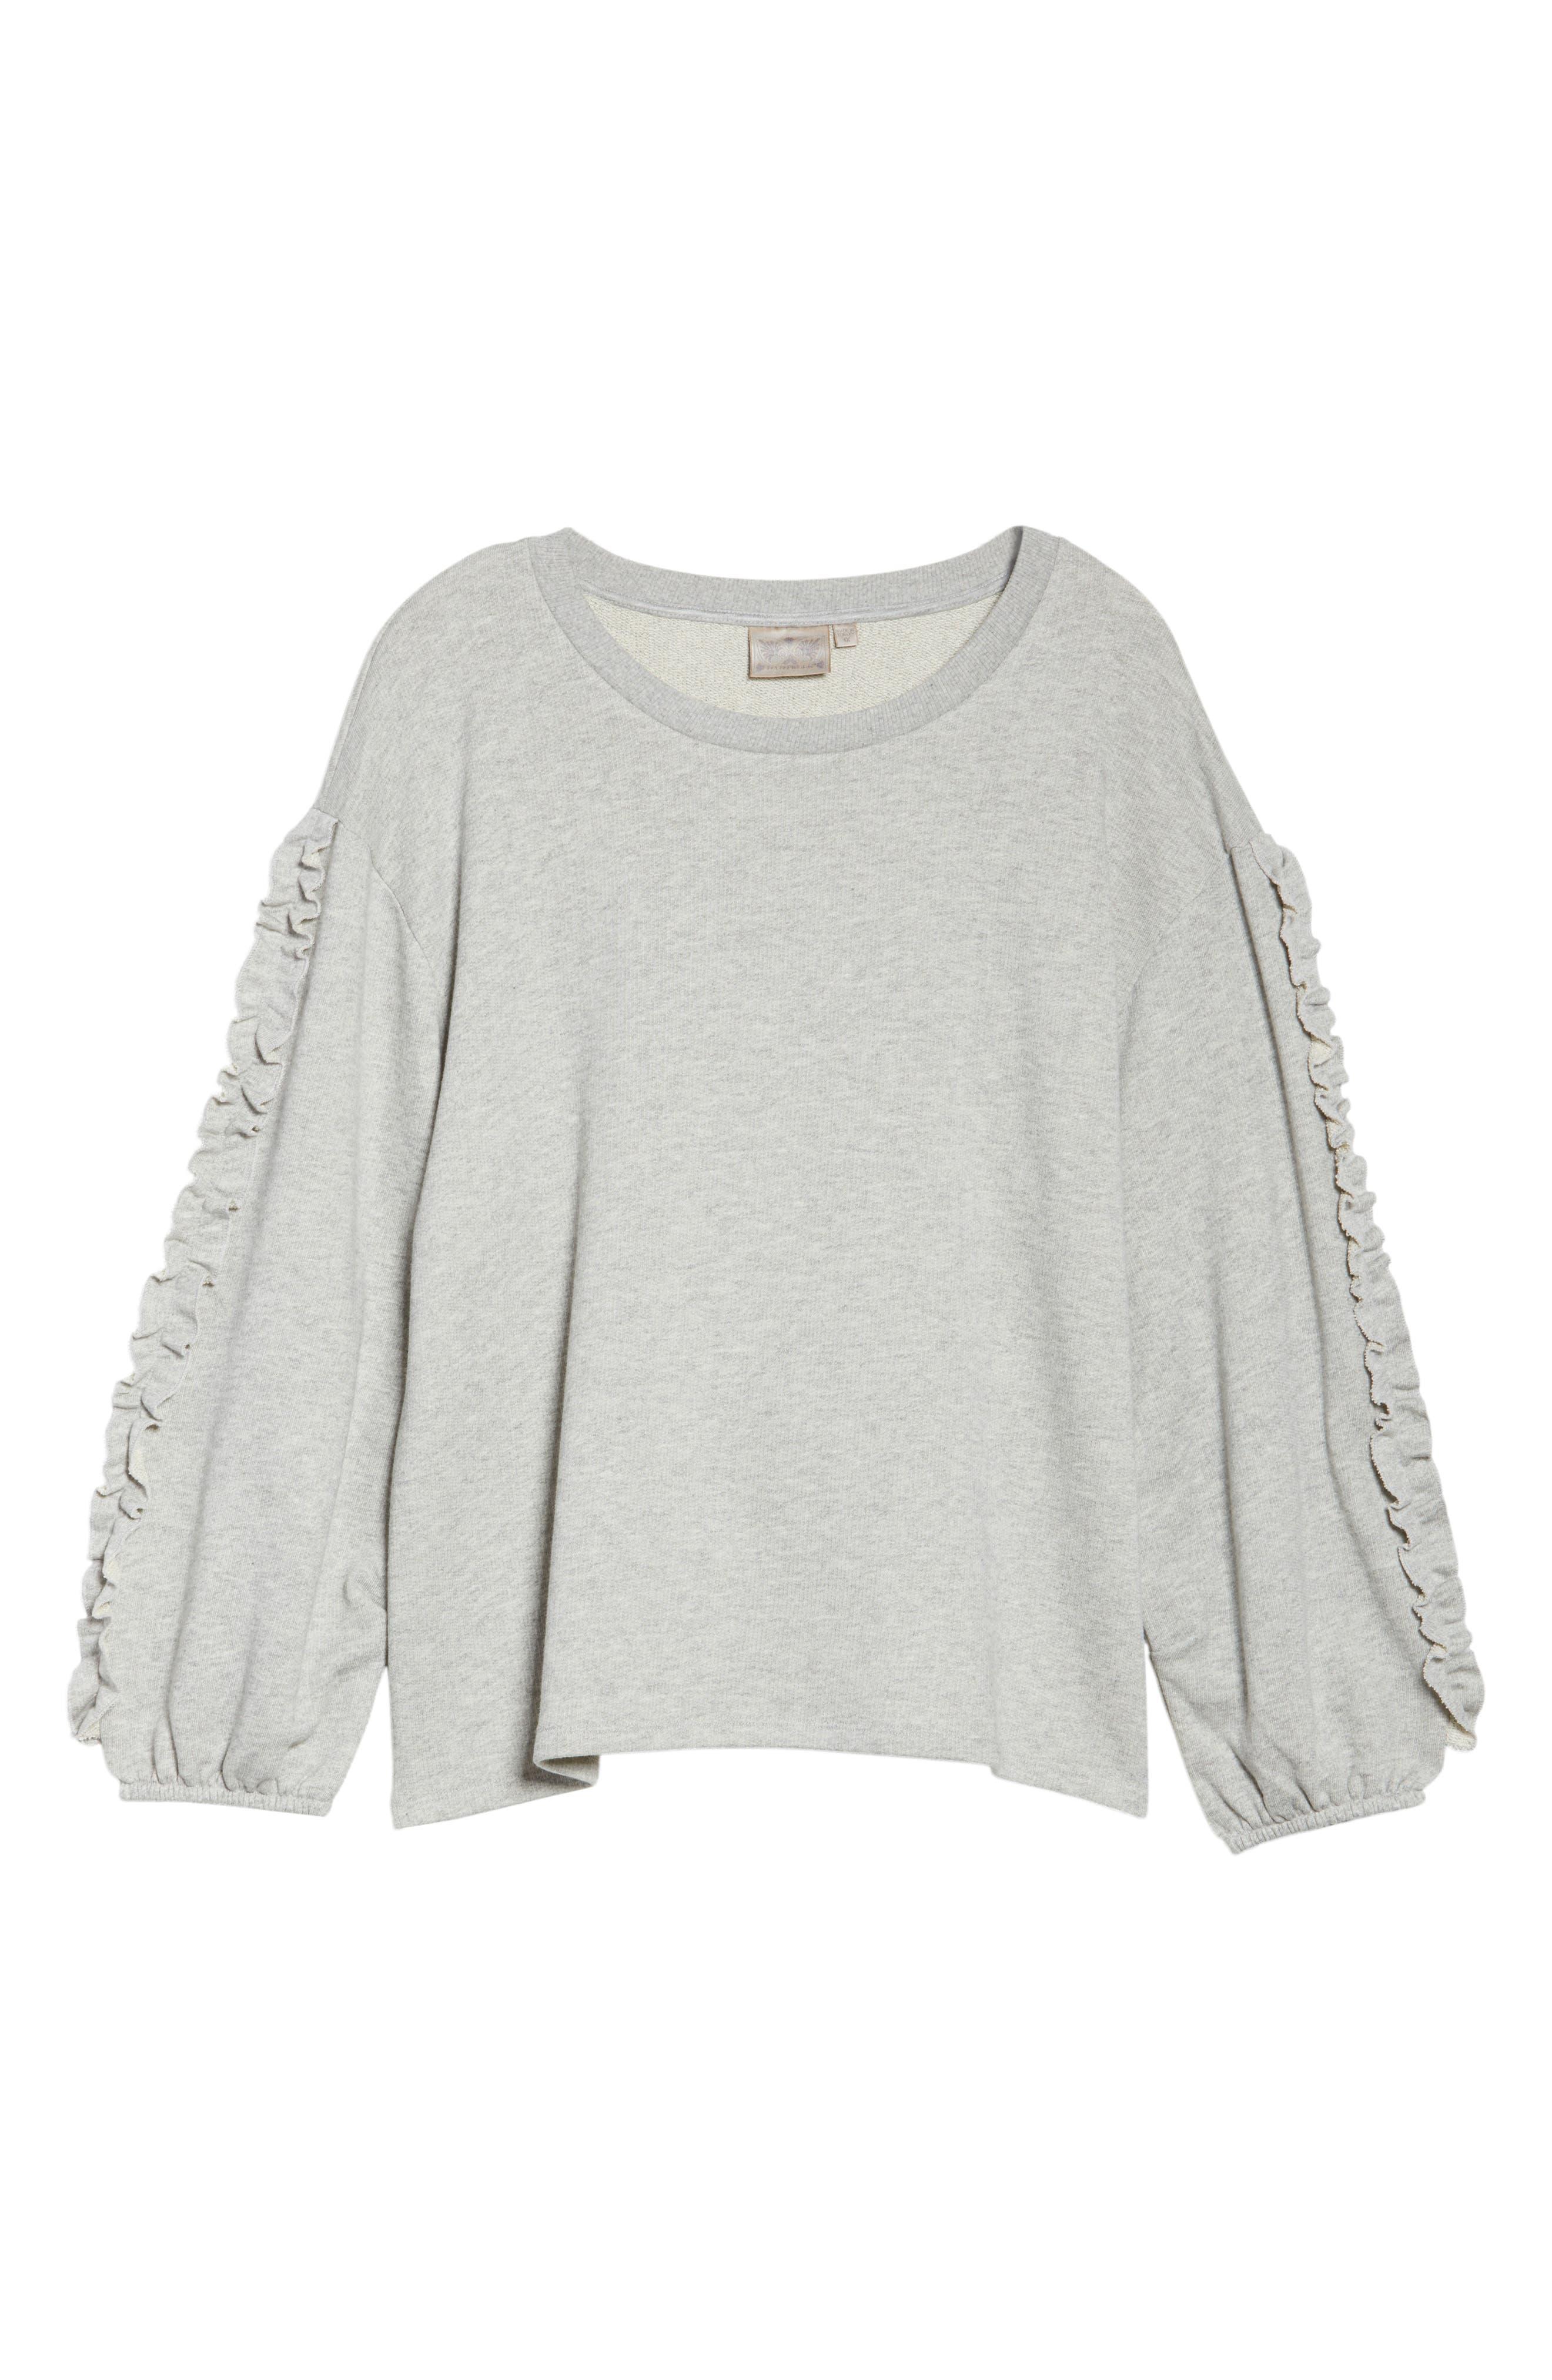 Ruffle Sleeve Sweatshirt,                             Alternate thumbnail 6, color,